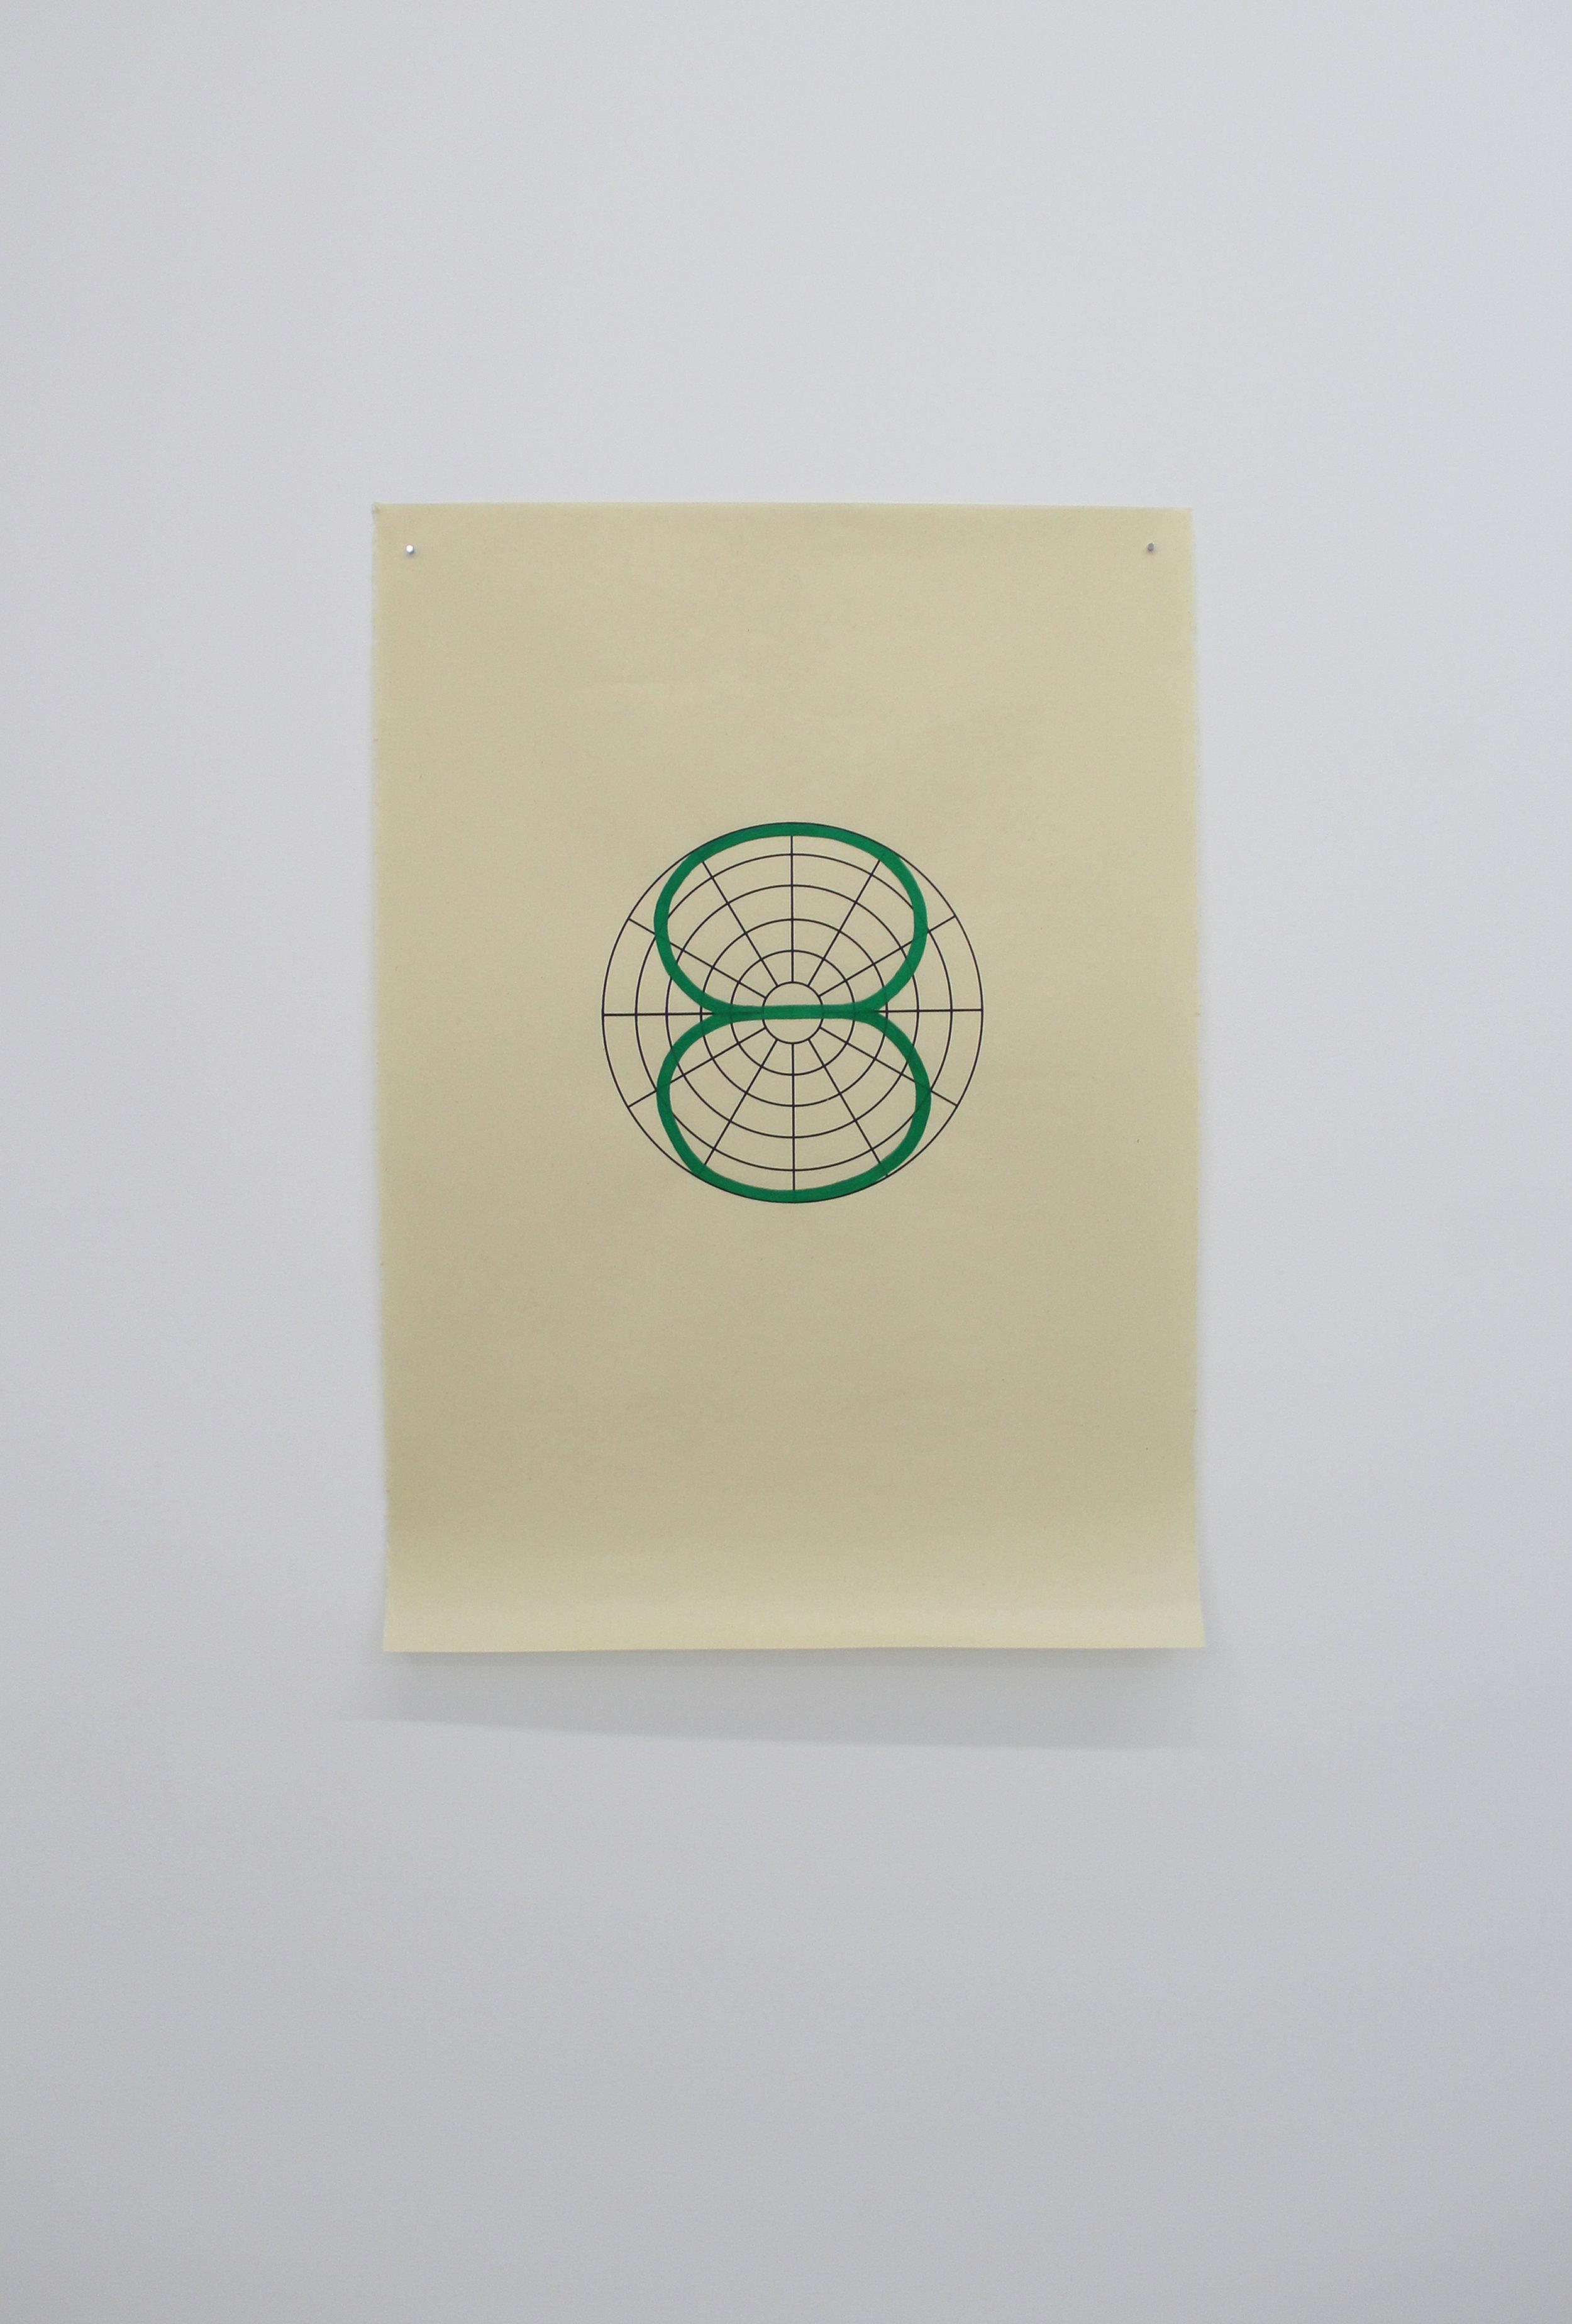 Antonin Gerson,  Vert - Bi-Directionnel , Sérigraphie, gouache, 58x84cm, 2018